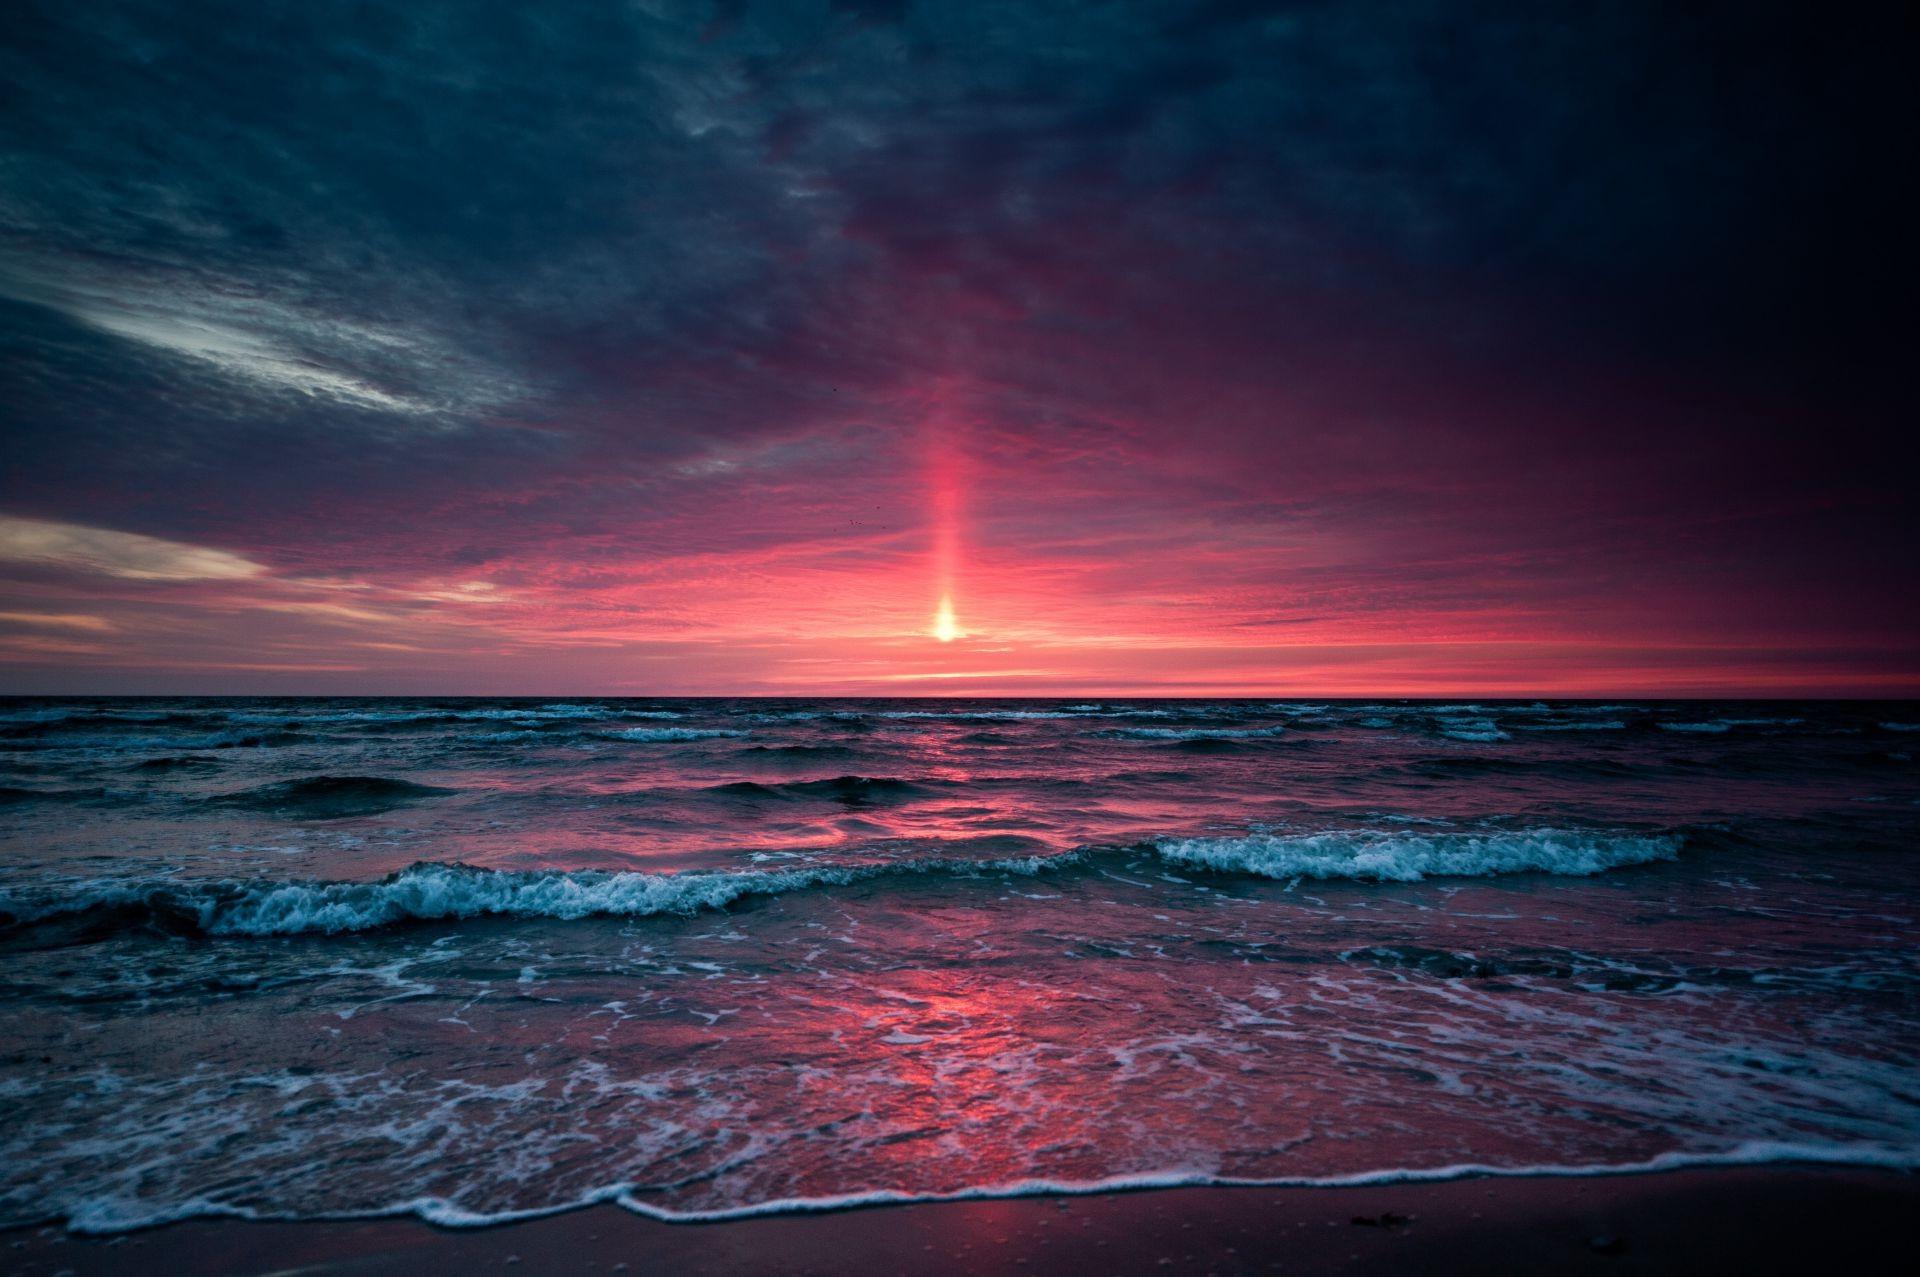 wpid-Fc4nU5eQUsY.jpg. wpid Fc4nU5eQUsY Красочный закат в разных уголках планеты.